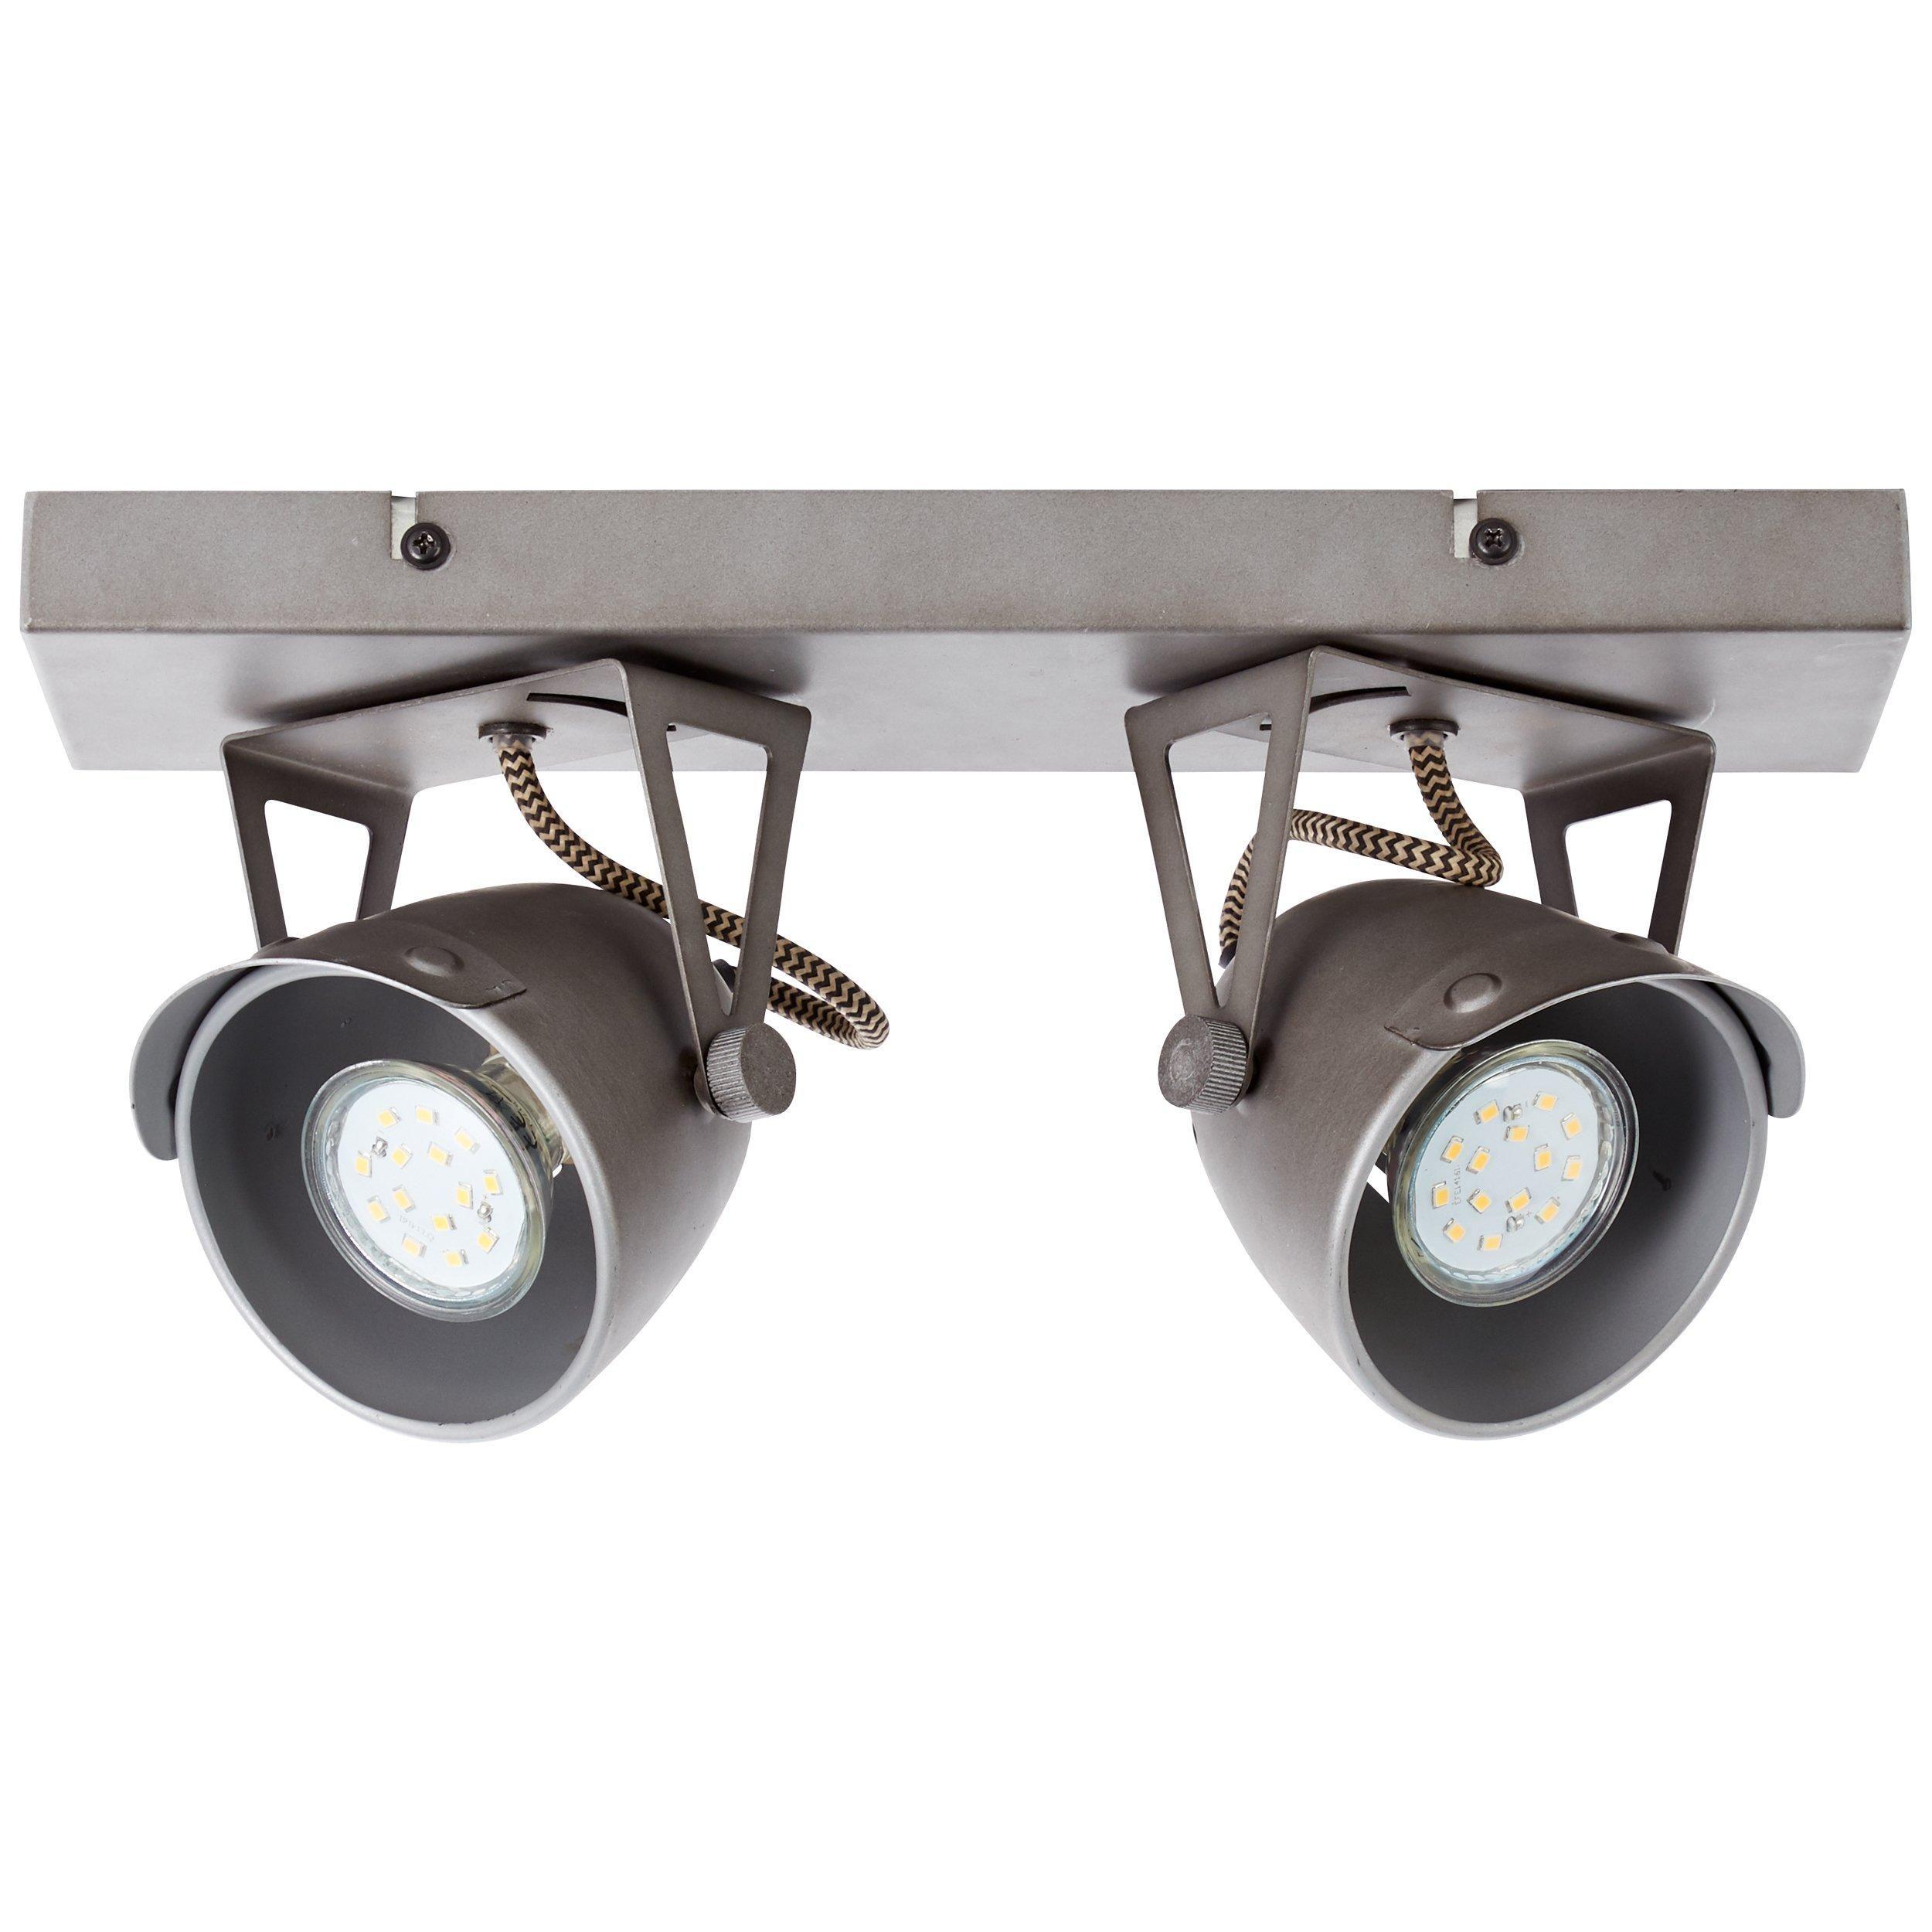 Badezimmer Beleuchtung Indirekt Deckenlampe Weiss Led Led Strahler 6 Flammig Dimmbar Led Decke Deckenstrahler Beleuchtung Decke Deckenleuchte Schlafzimmer